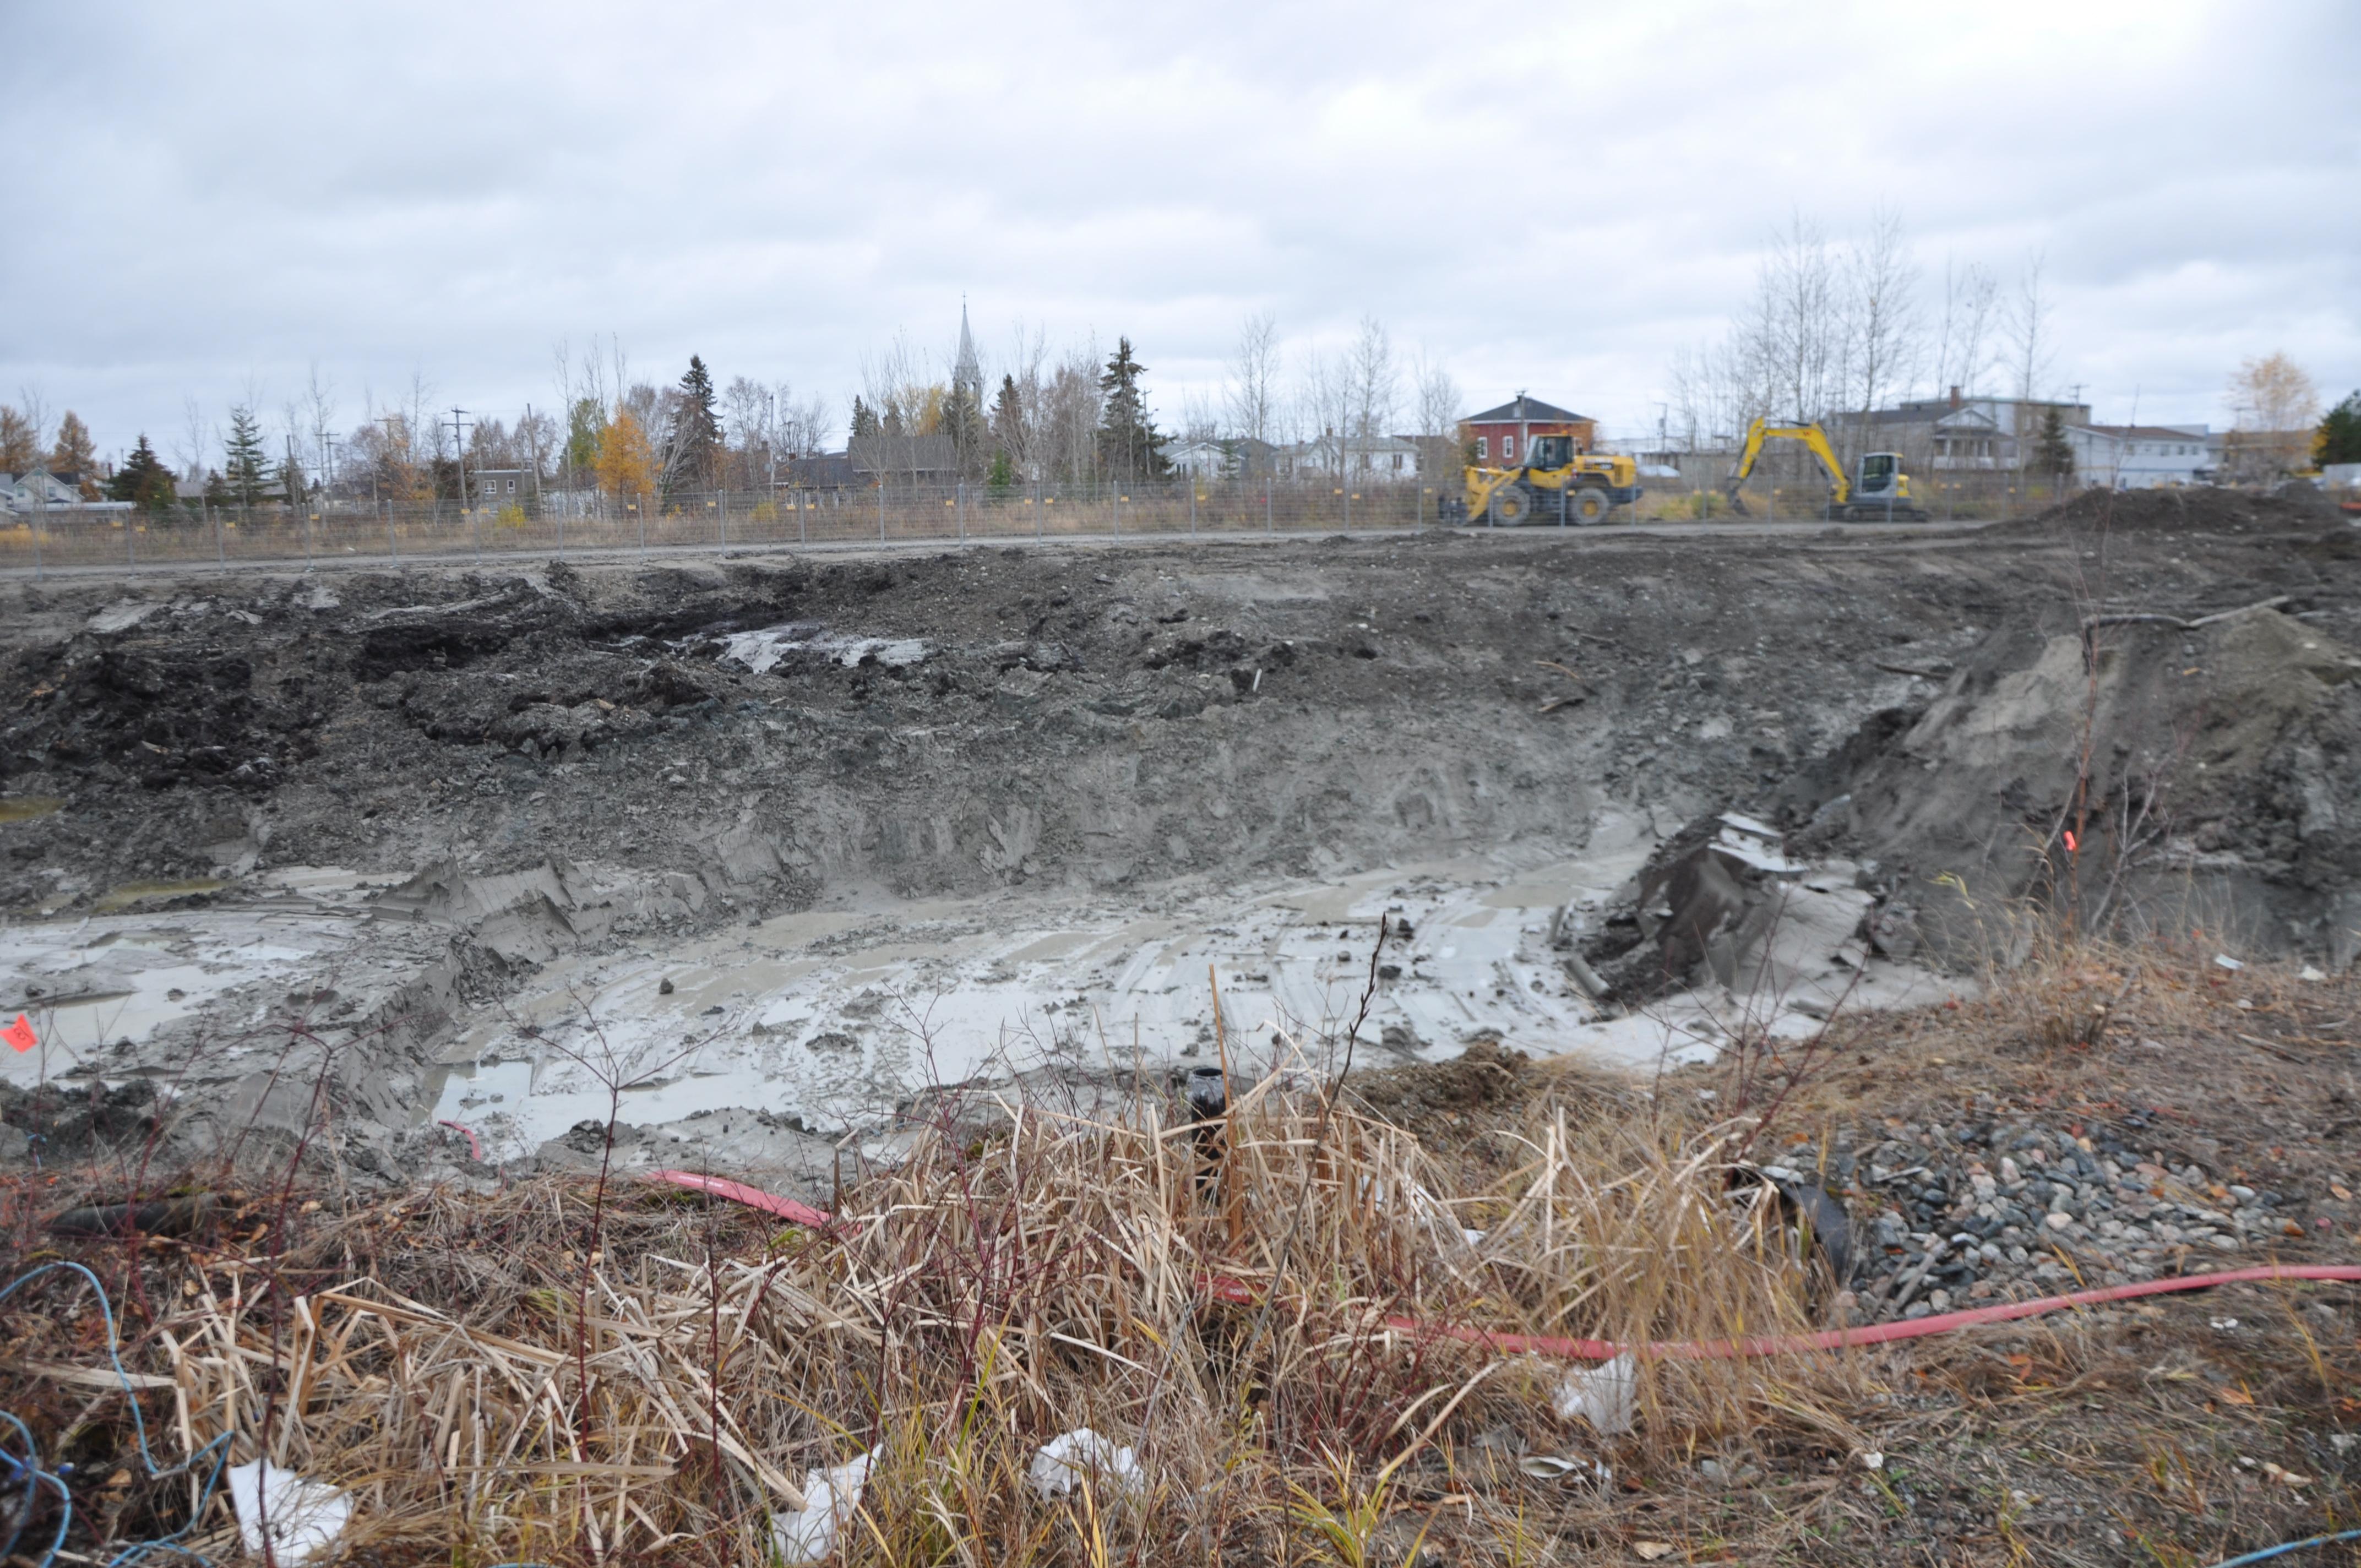 Terrain CN contaminé La Sarre